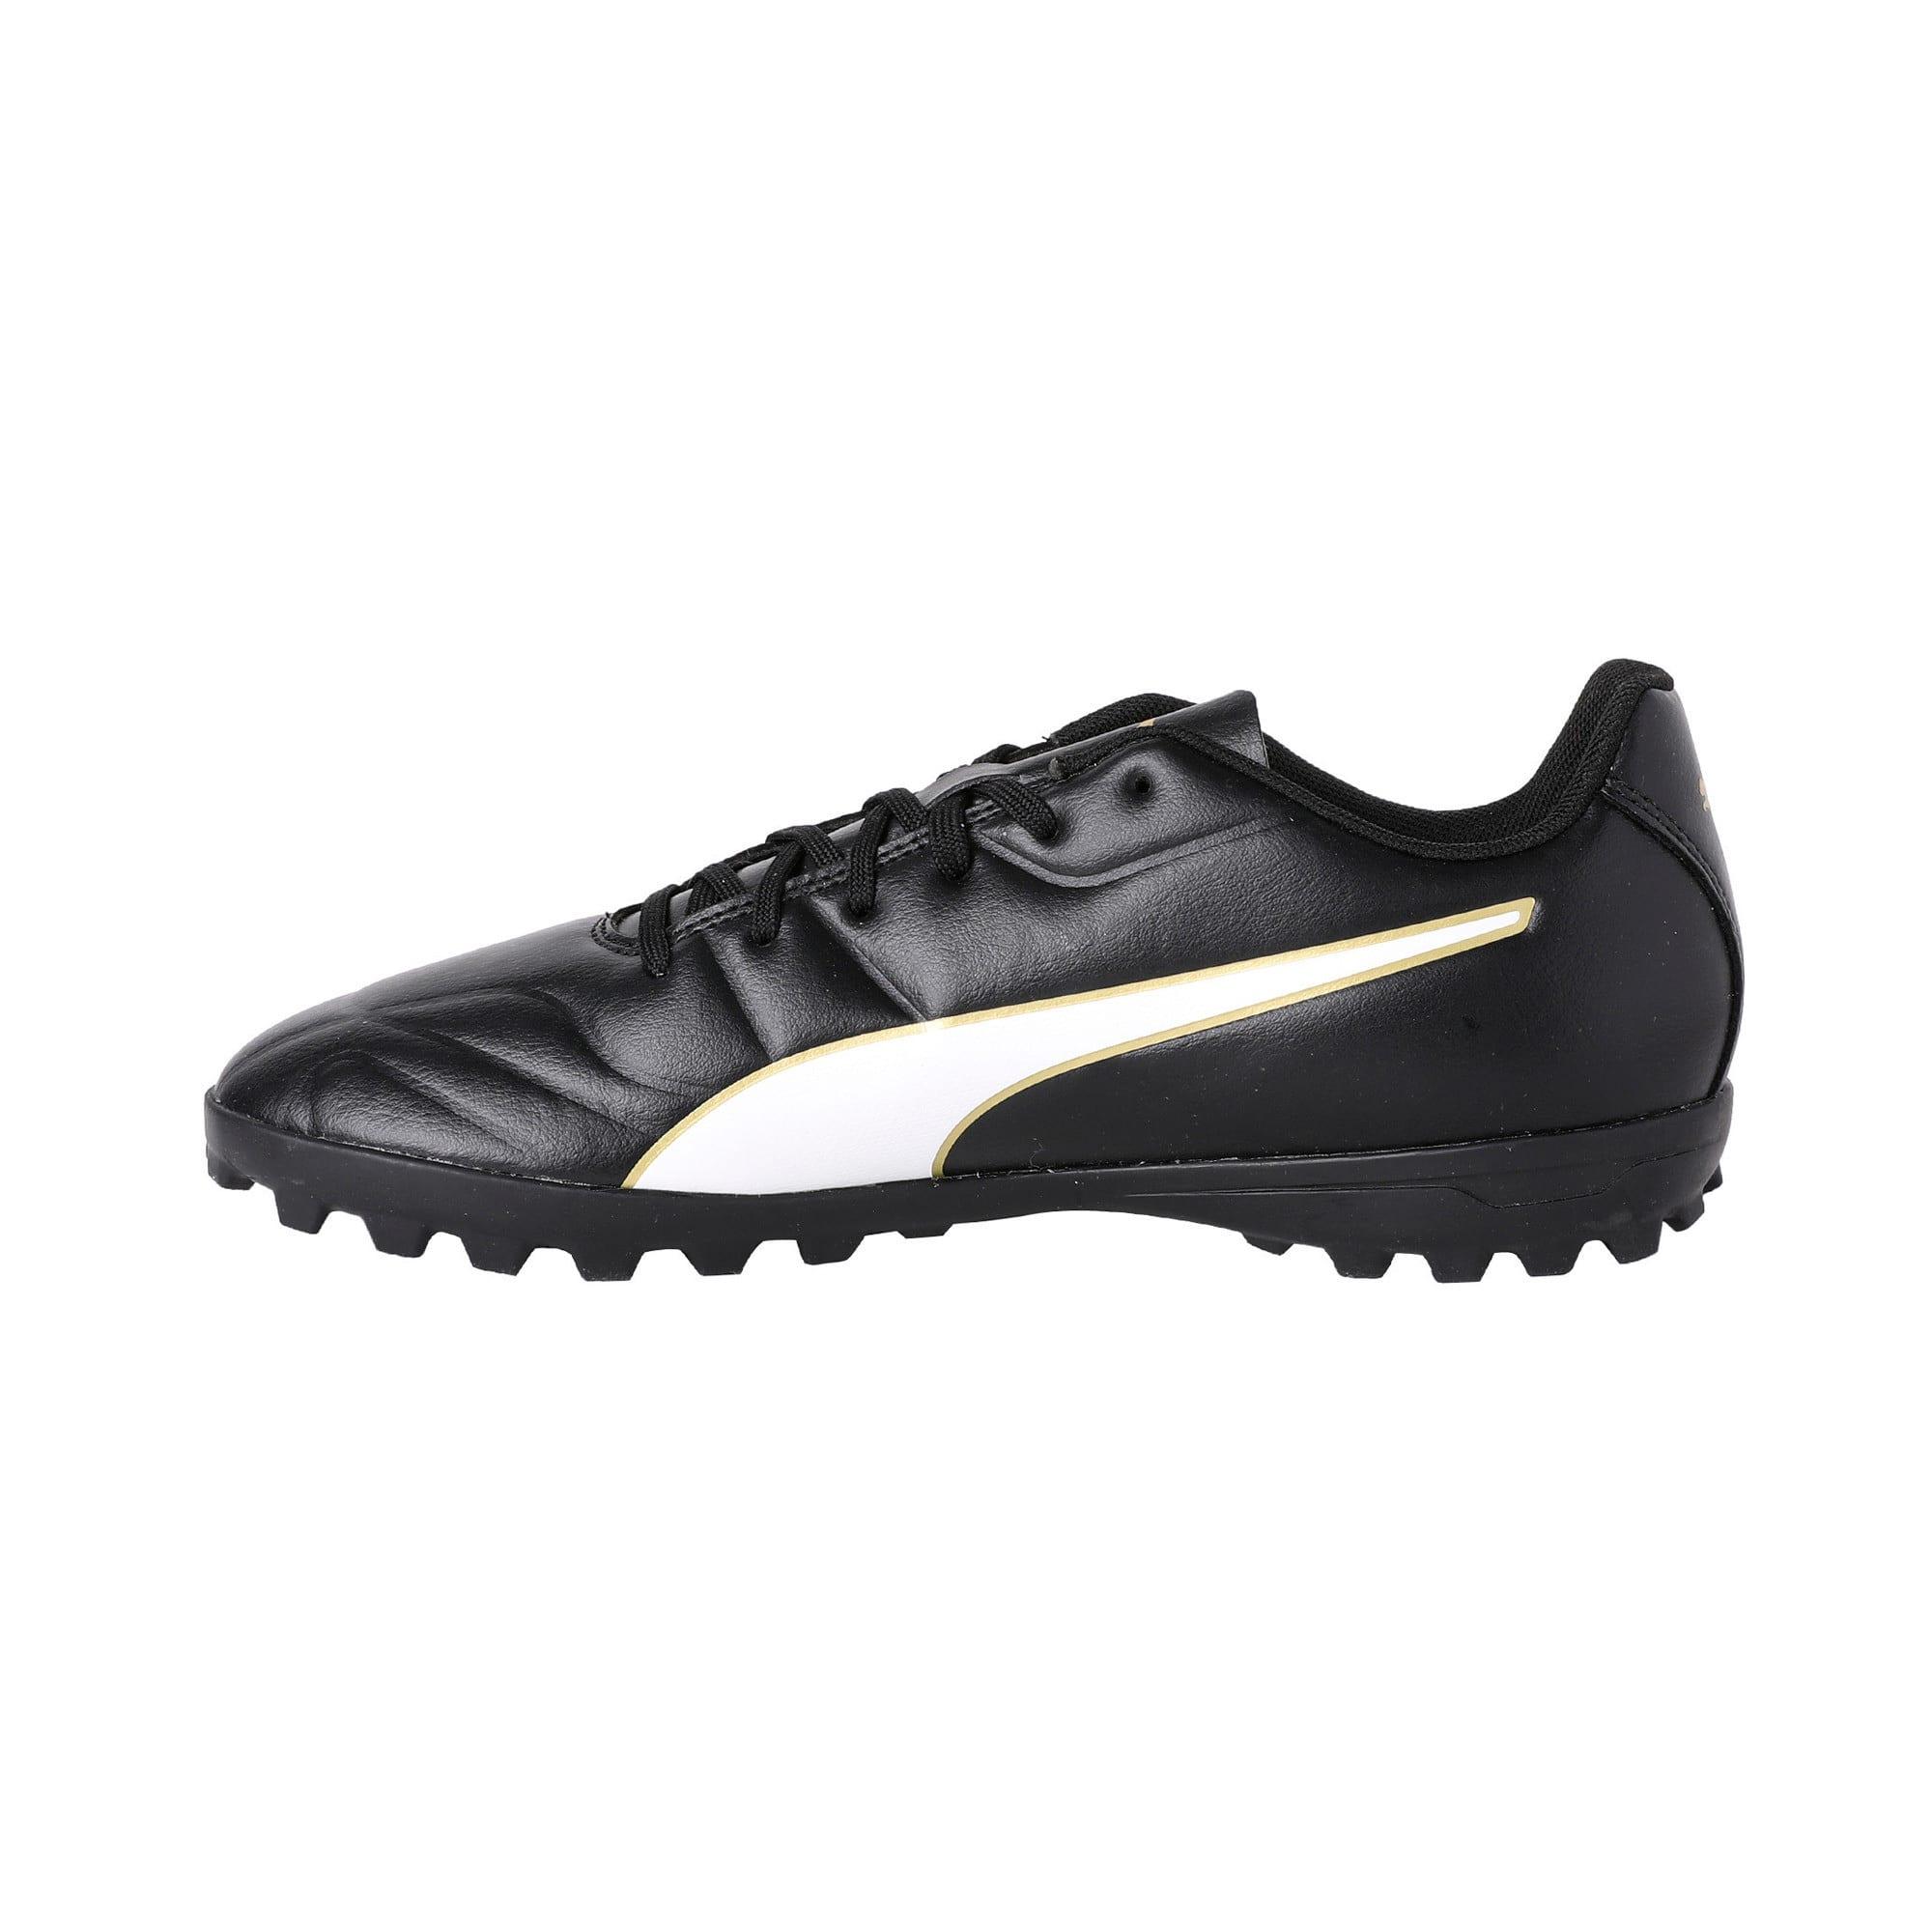 Thumbnail 1 of Classico C II Men's Football Boots, Black-White-Gold, medium-IND